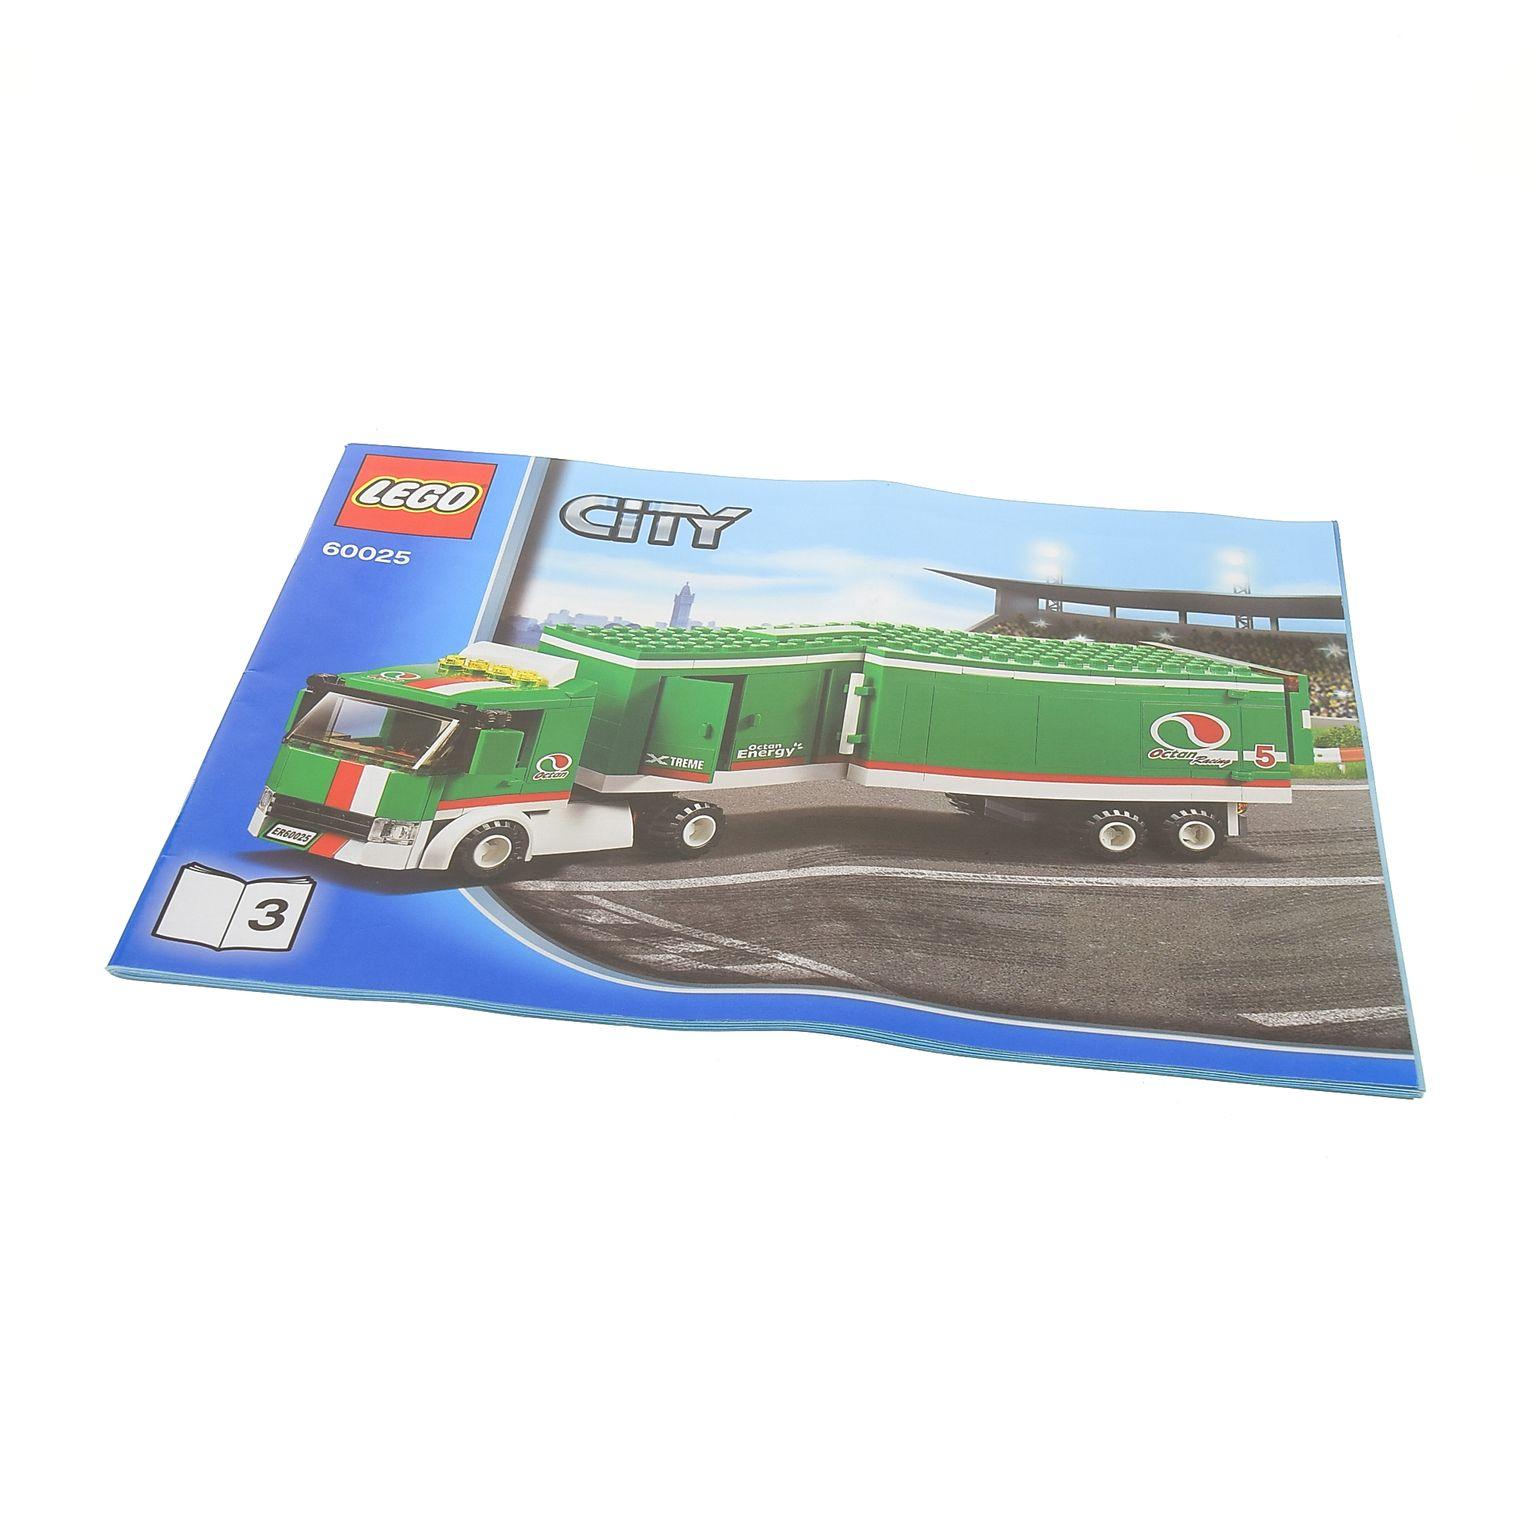 1 X Lego Brick Instructions Town City Race Grand Prix Truck Booklet